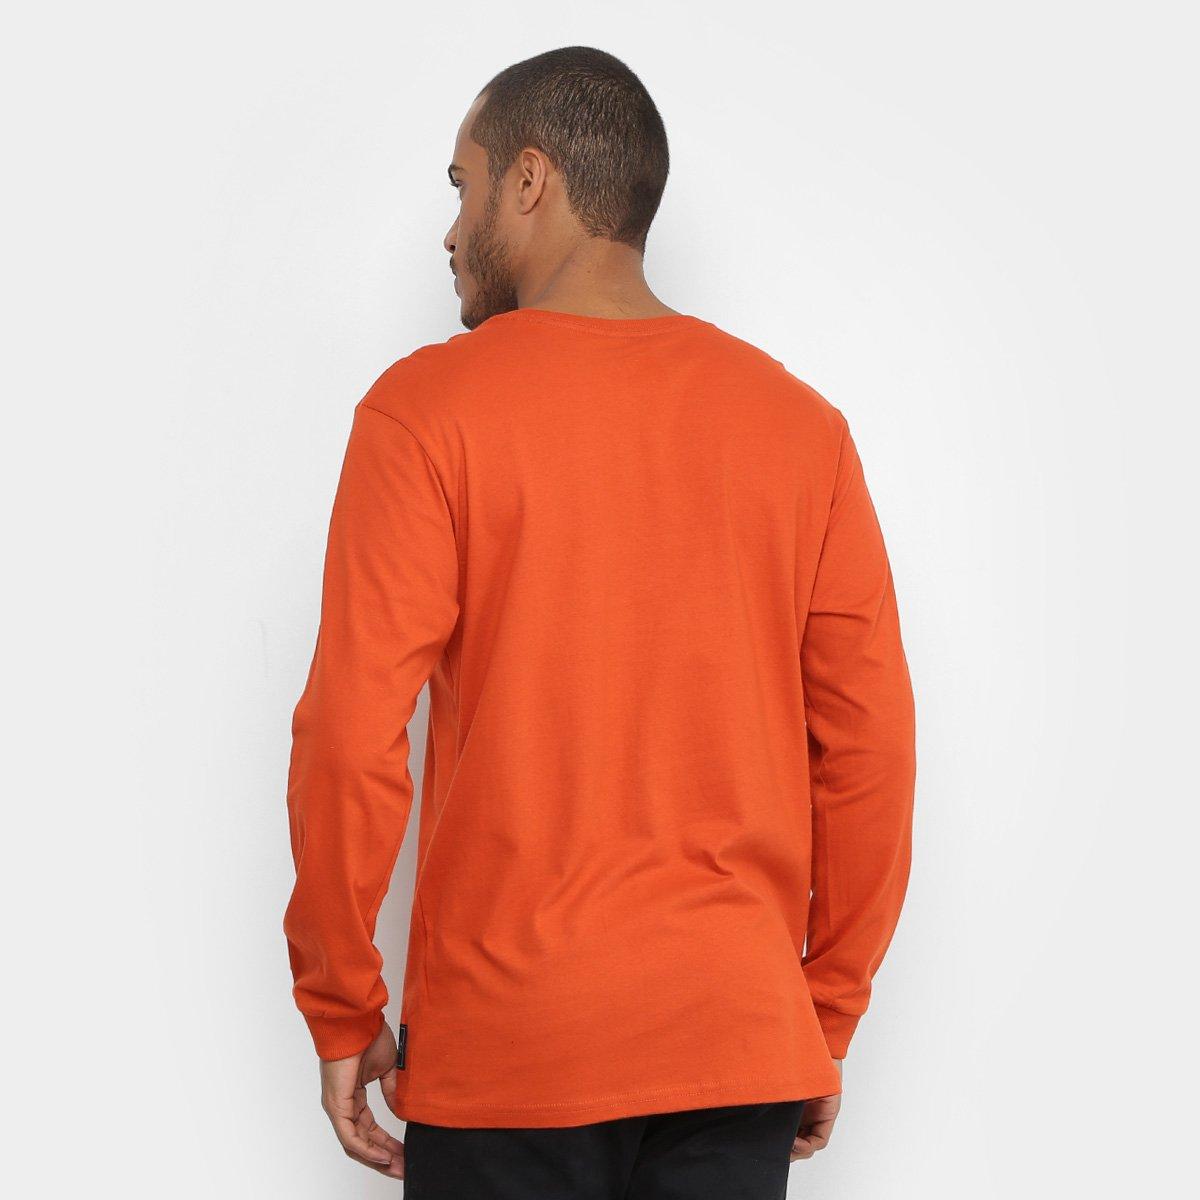 Camiseta Starter Manga Longa Pixo Color Masculina - Compre Agora ... a6fcad87ba3